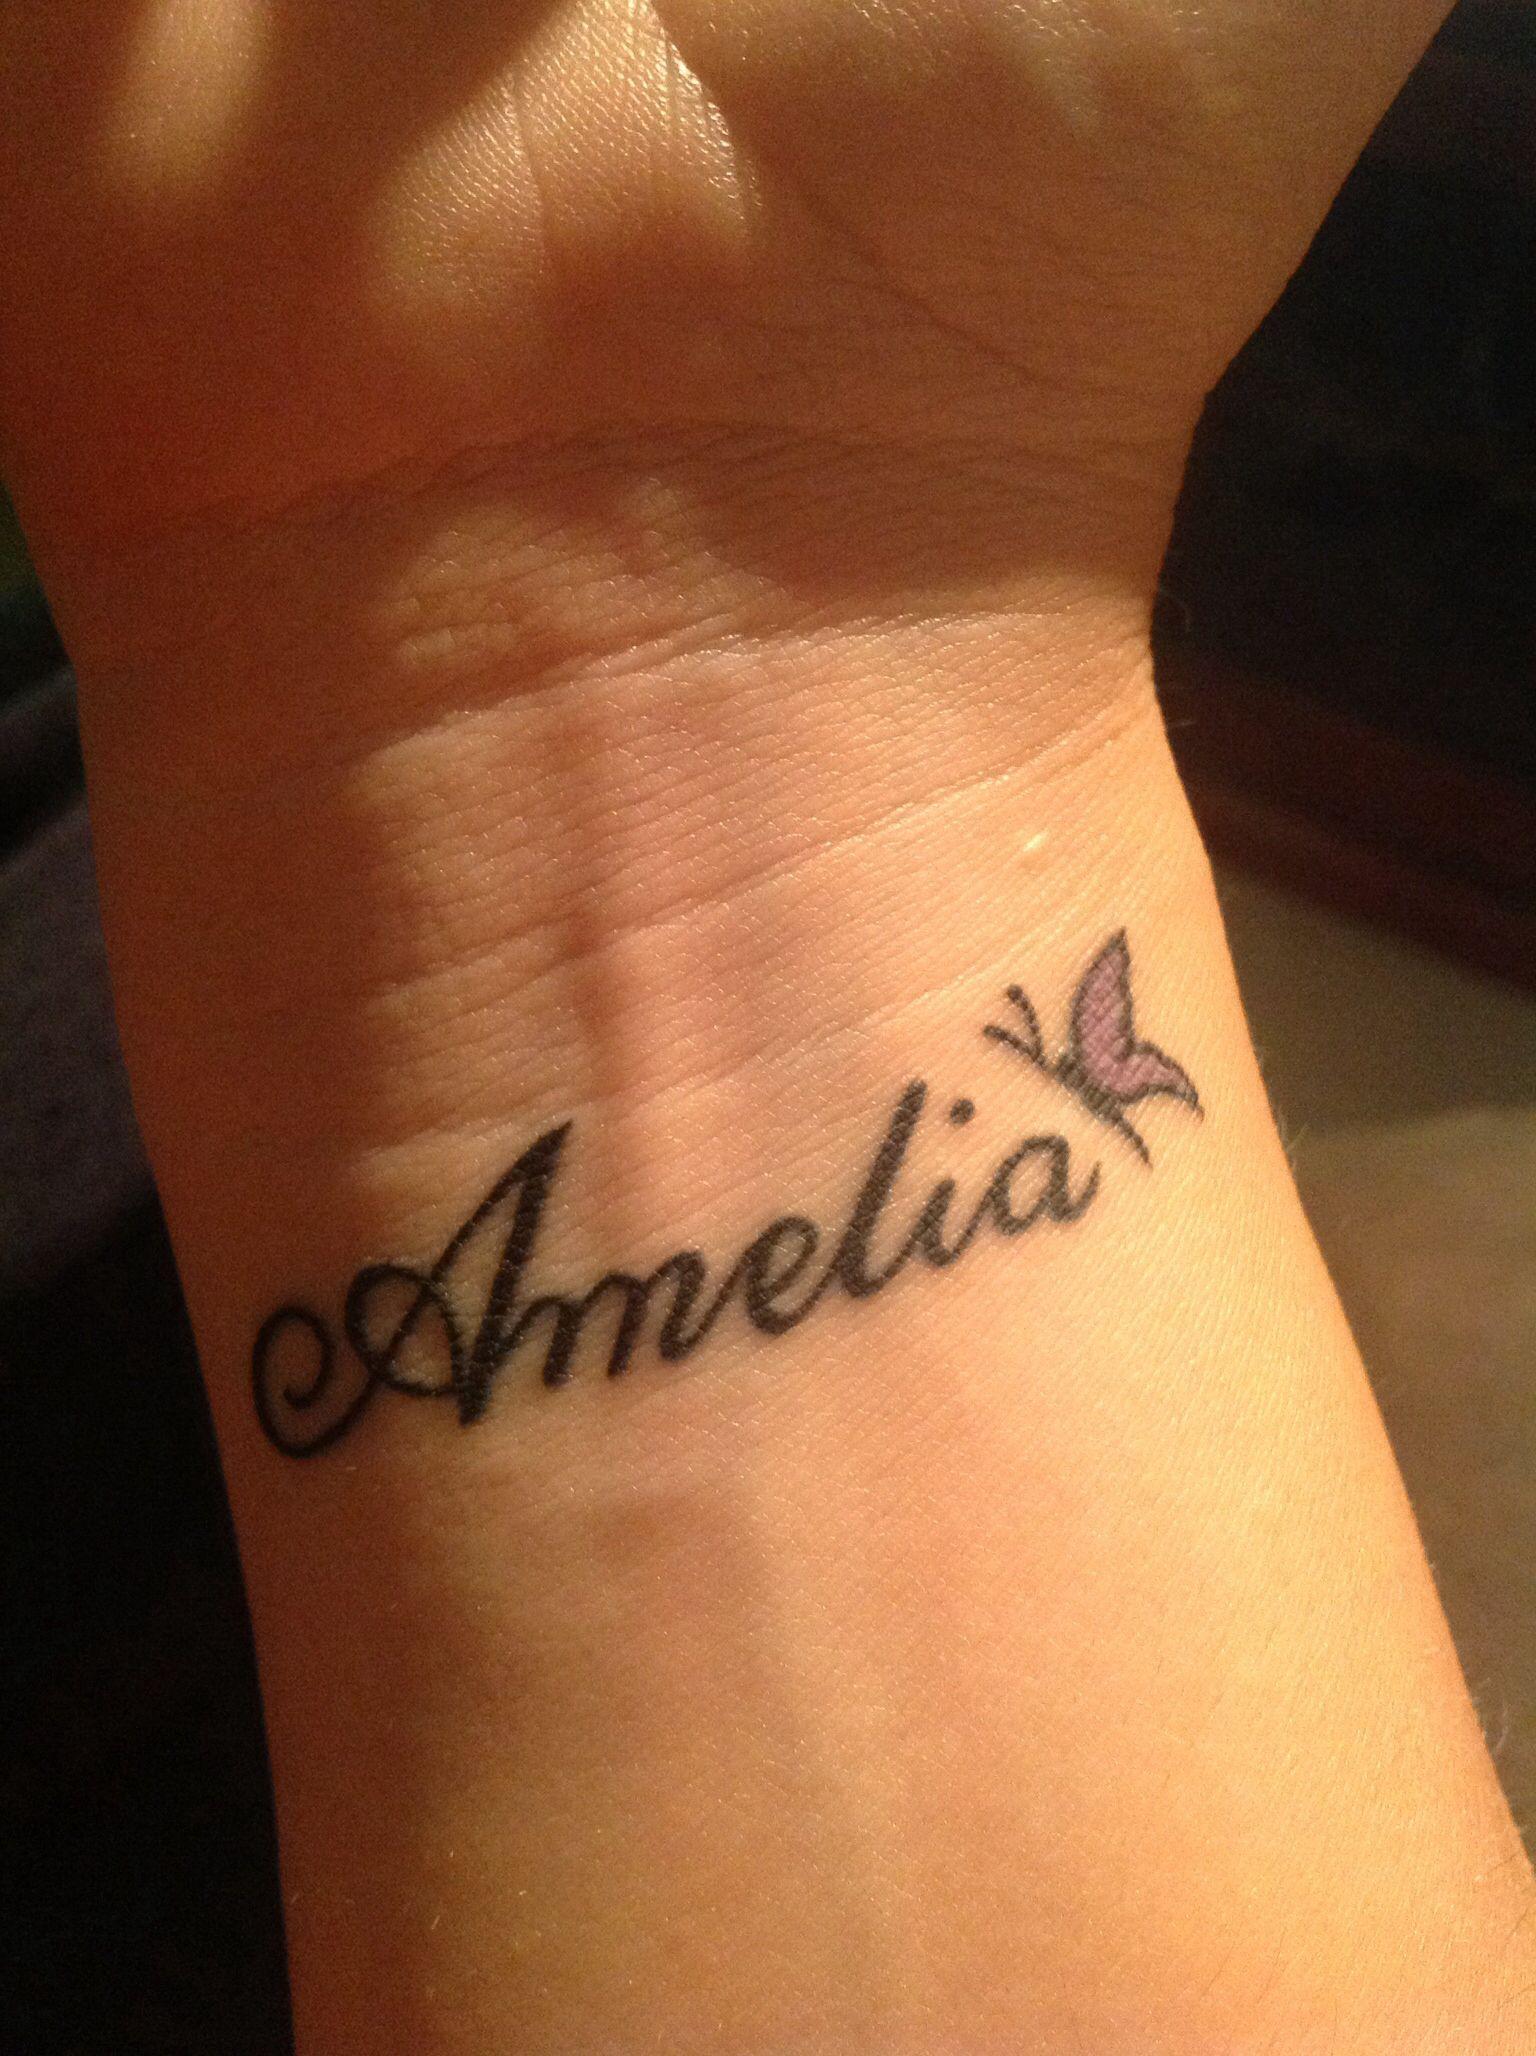 in loving memory of my beautiful daughter amelia louise xx tattoos pinterest memory. Black Bedroom Furniture Sets. Home Design Ideas